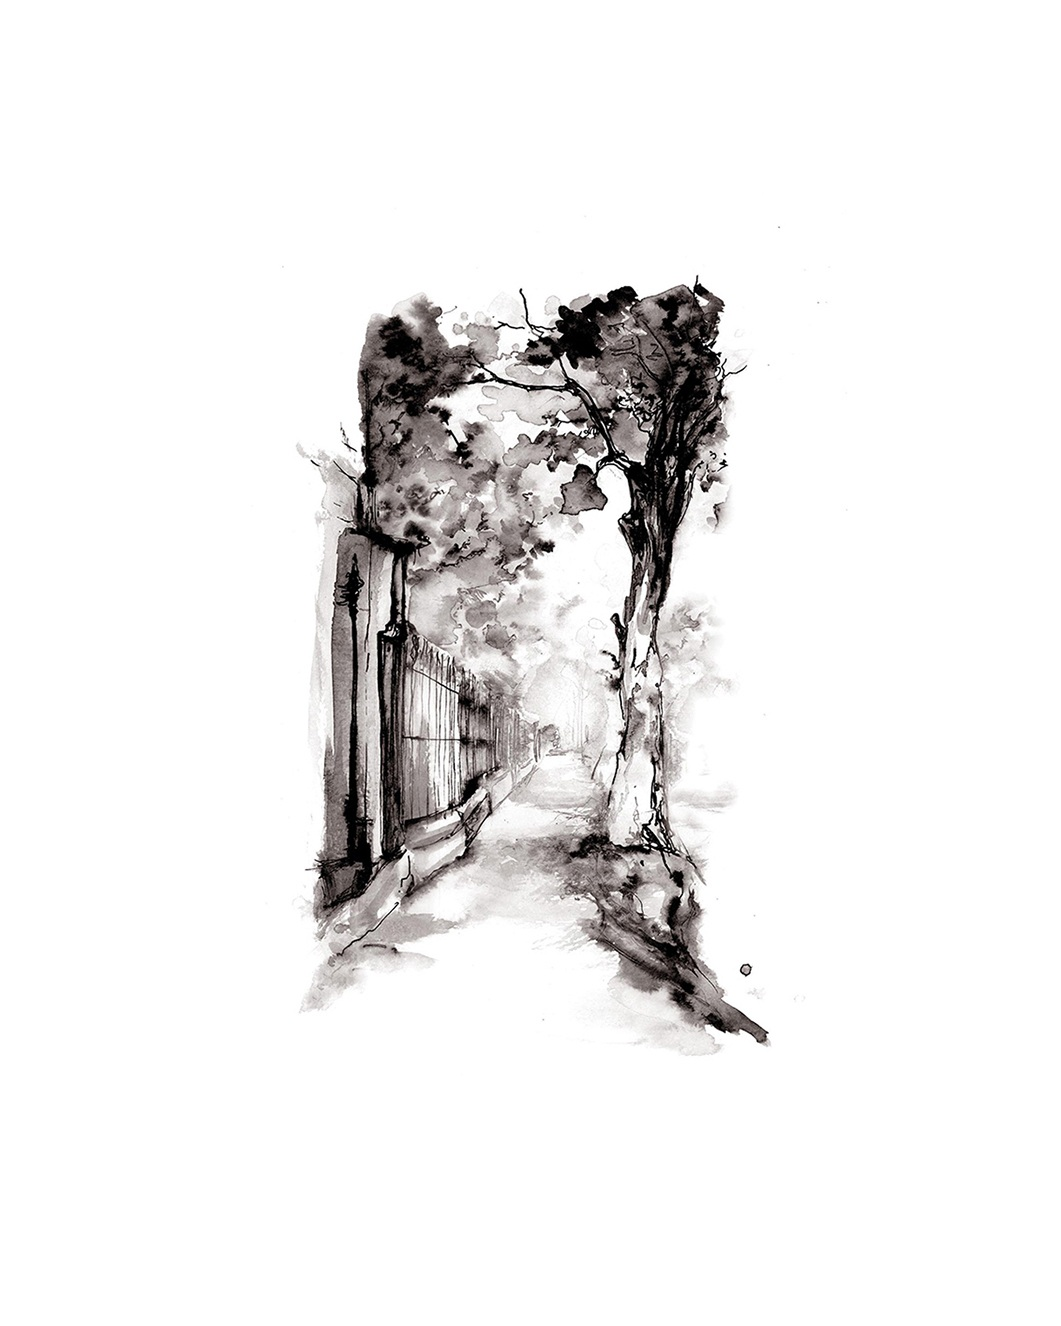 'Sidewalk'.  Fine Art Print by Artist, Dana Trijbetz.  Original Ink Painting made as a Giclée Print on 100% Cotton Paper.  Image 2 of 3.jpg